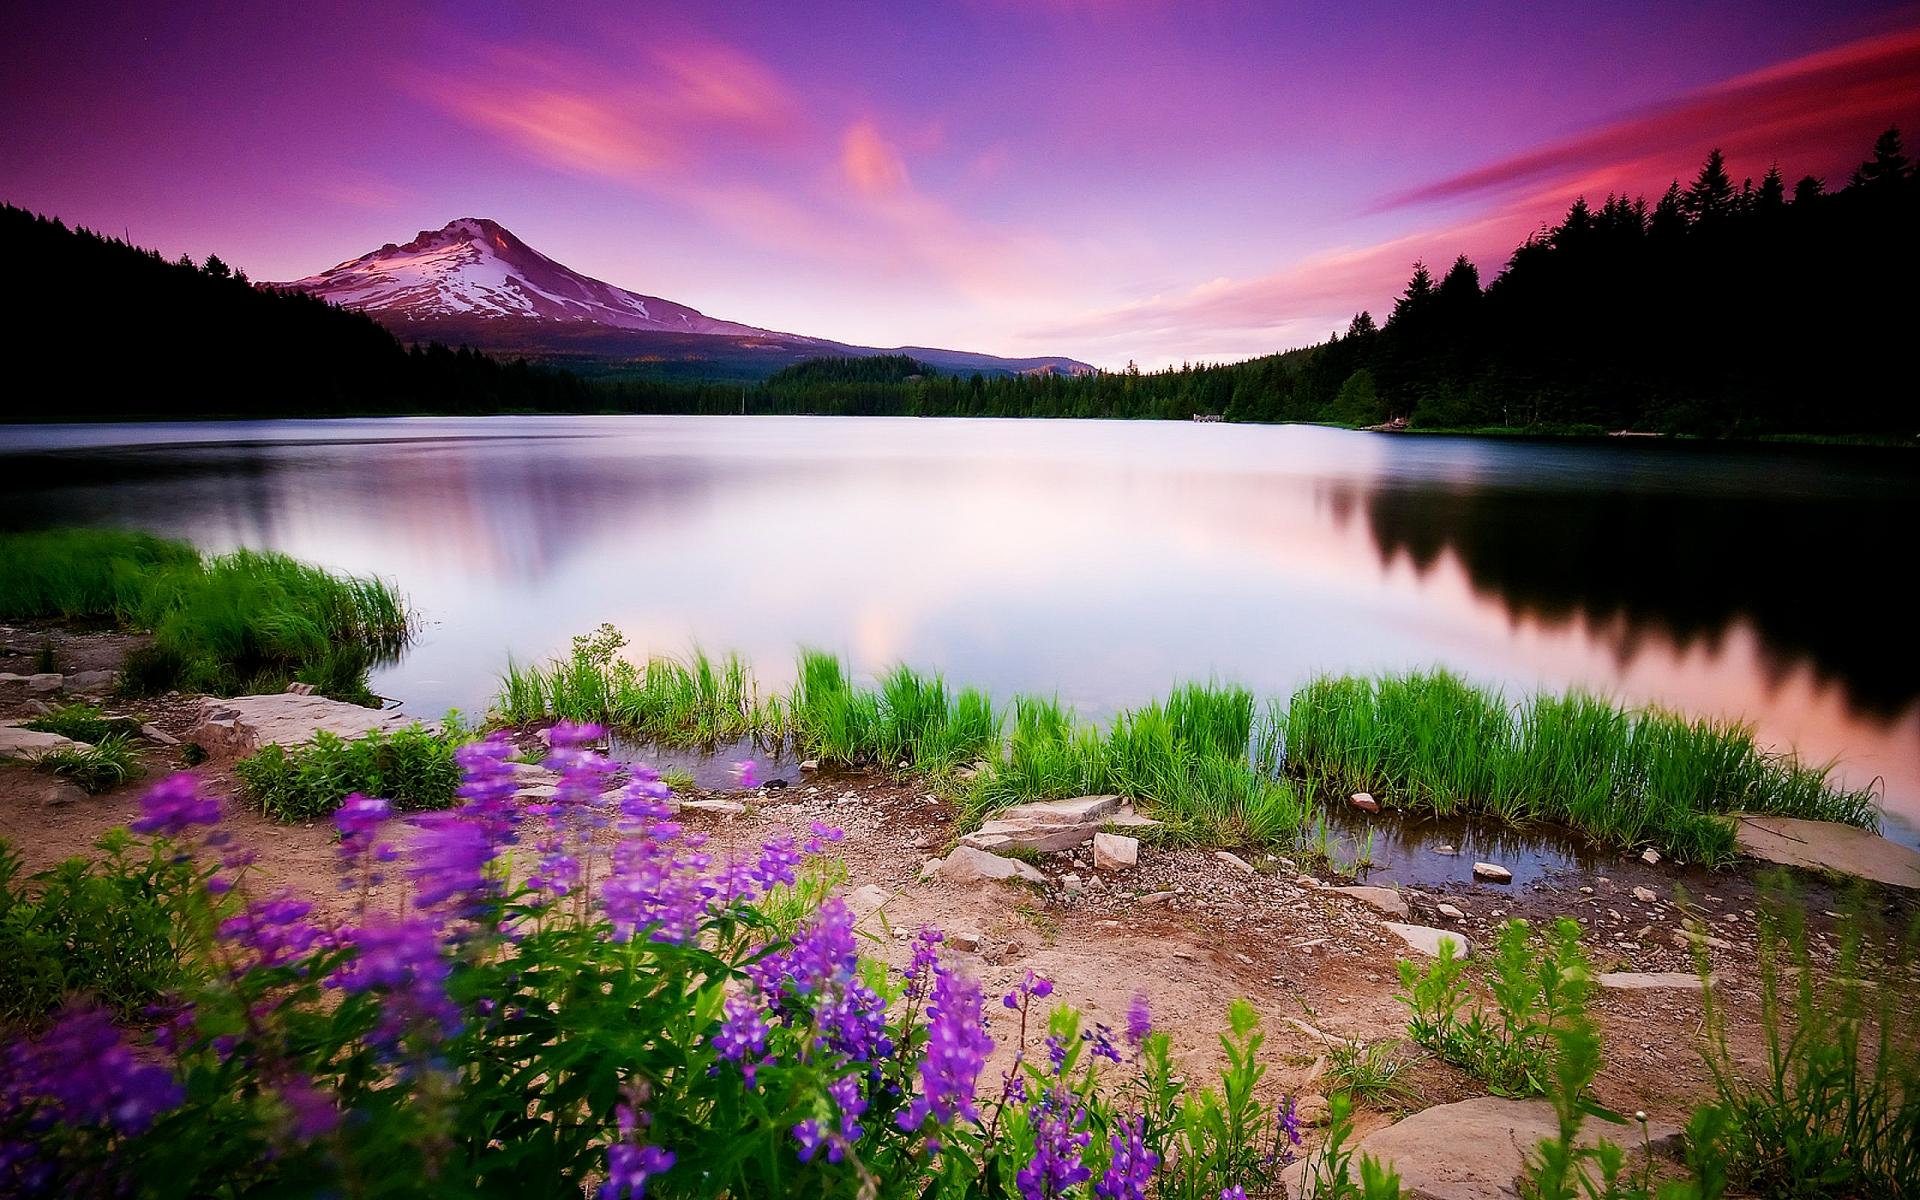 Lake Wallpaper Image Picture